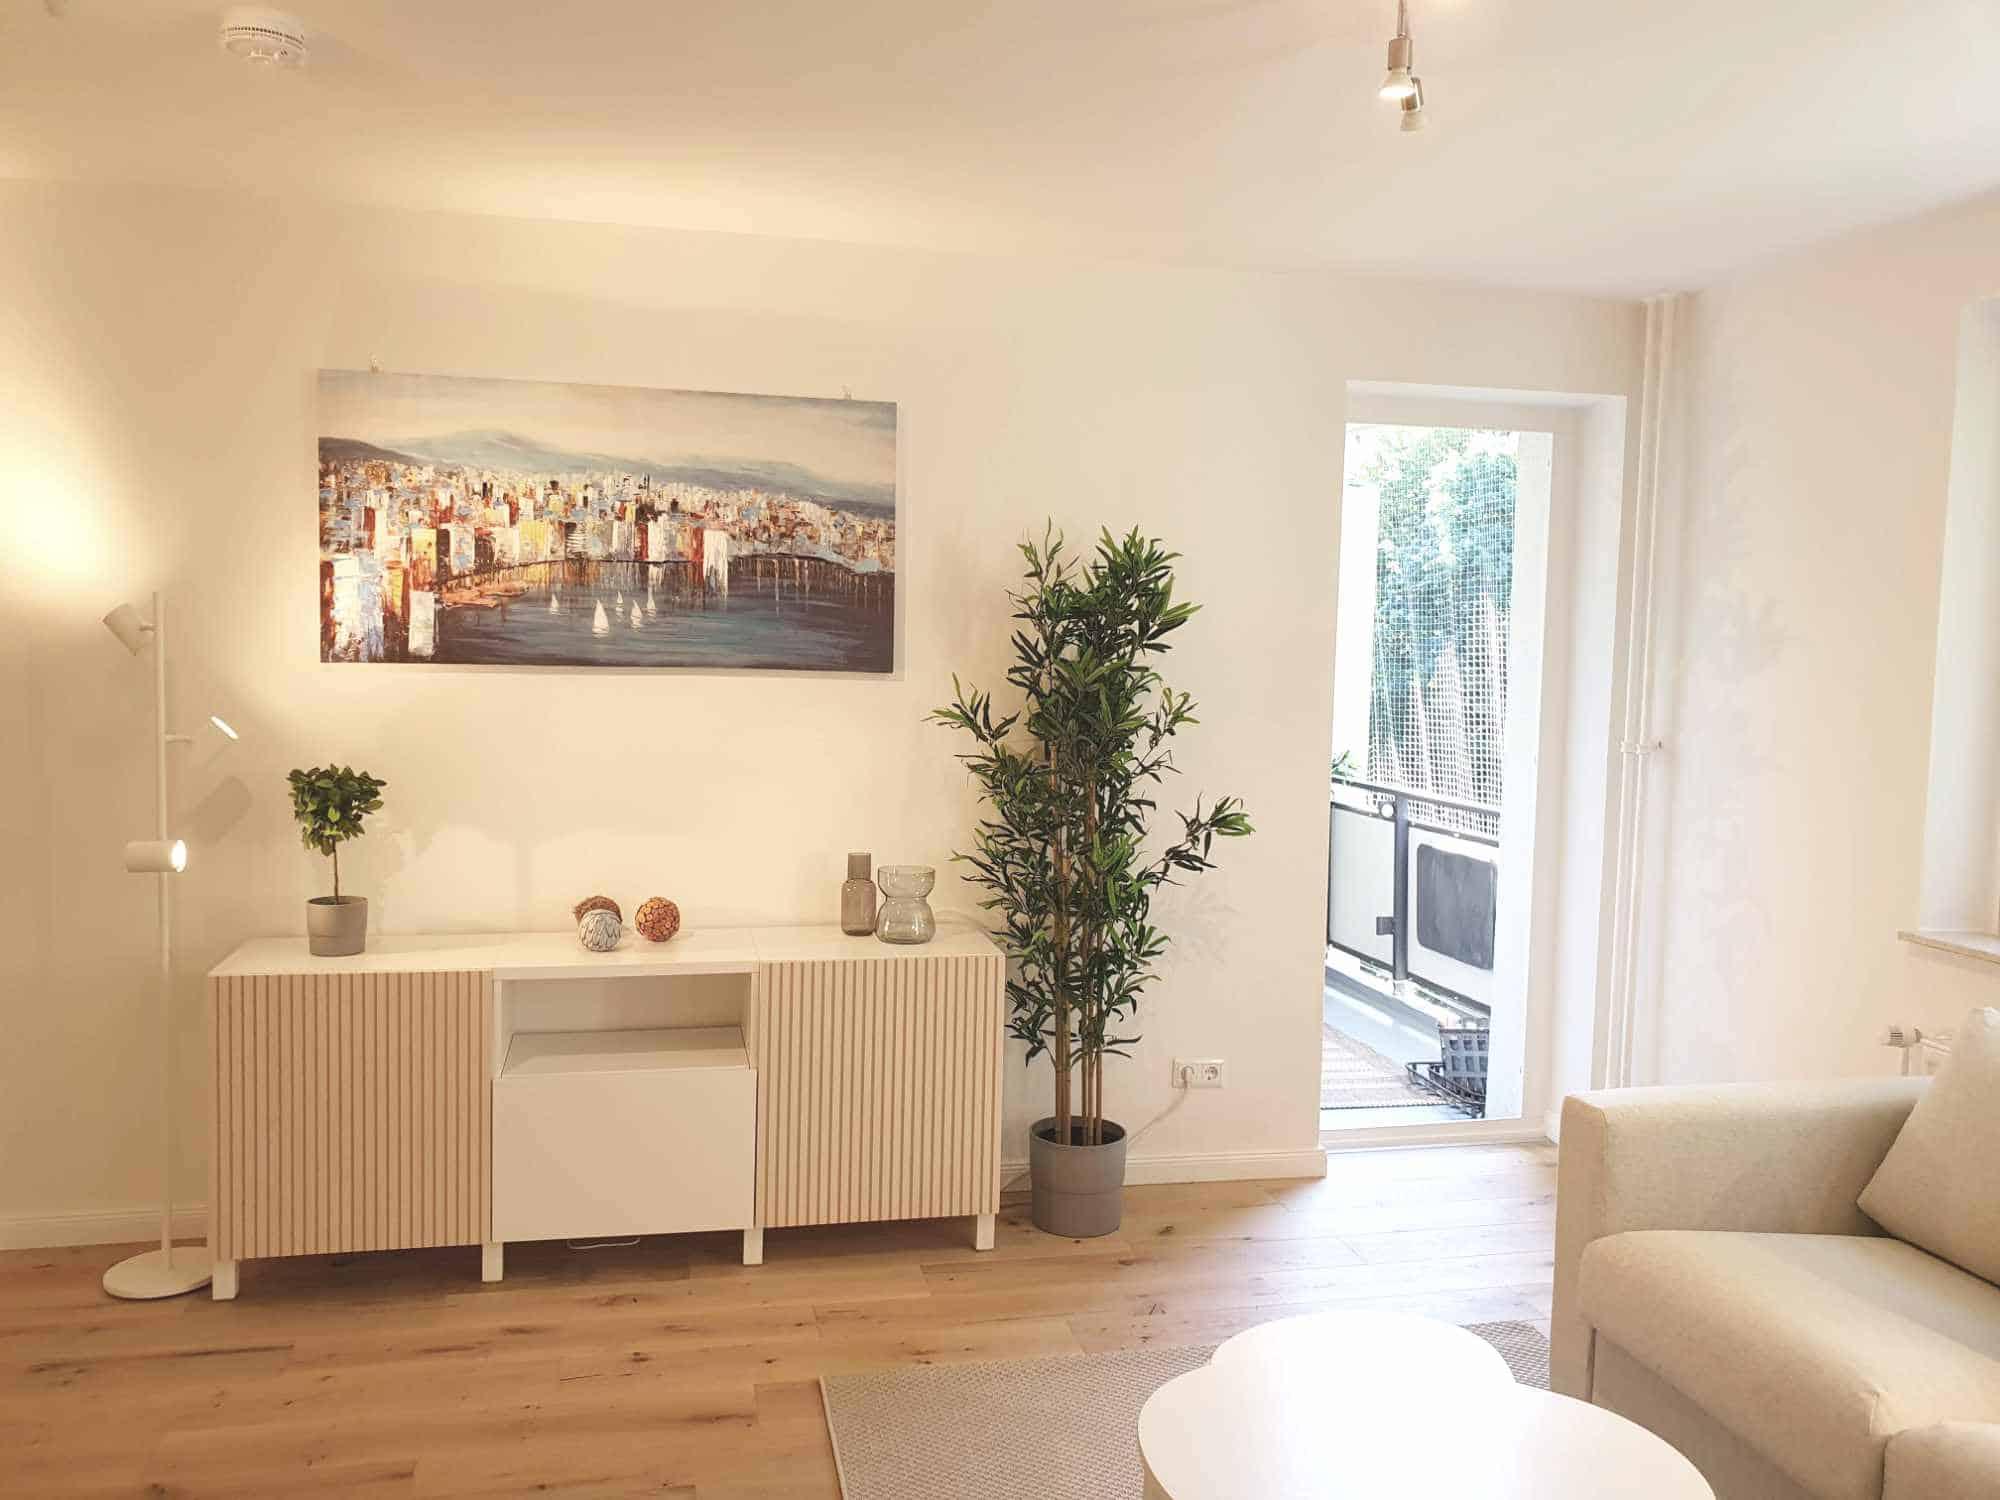 Provisionsfrei: 1 Zimmer Wohnung nahe UKE, Blick zum Balkon